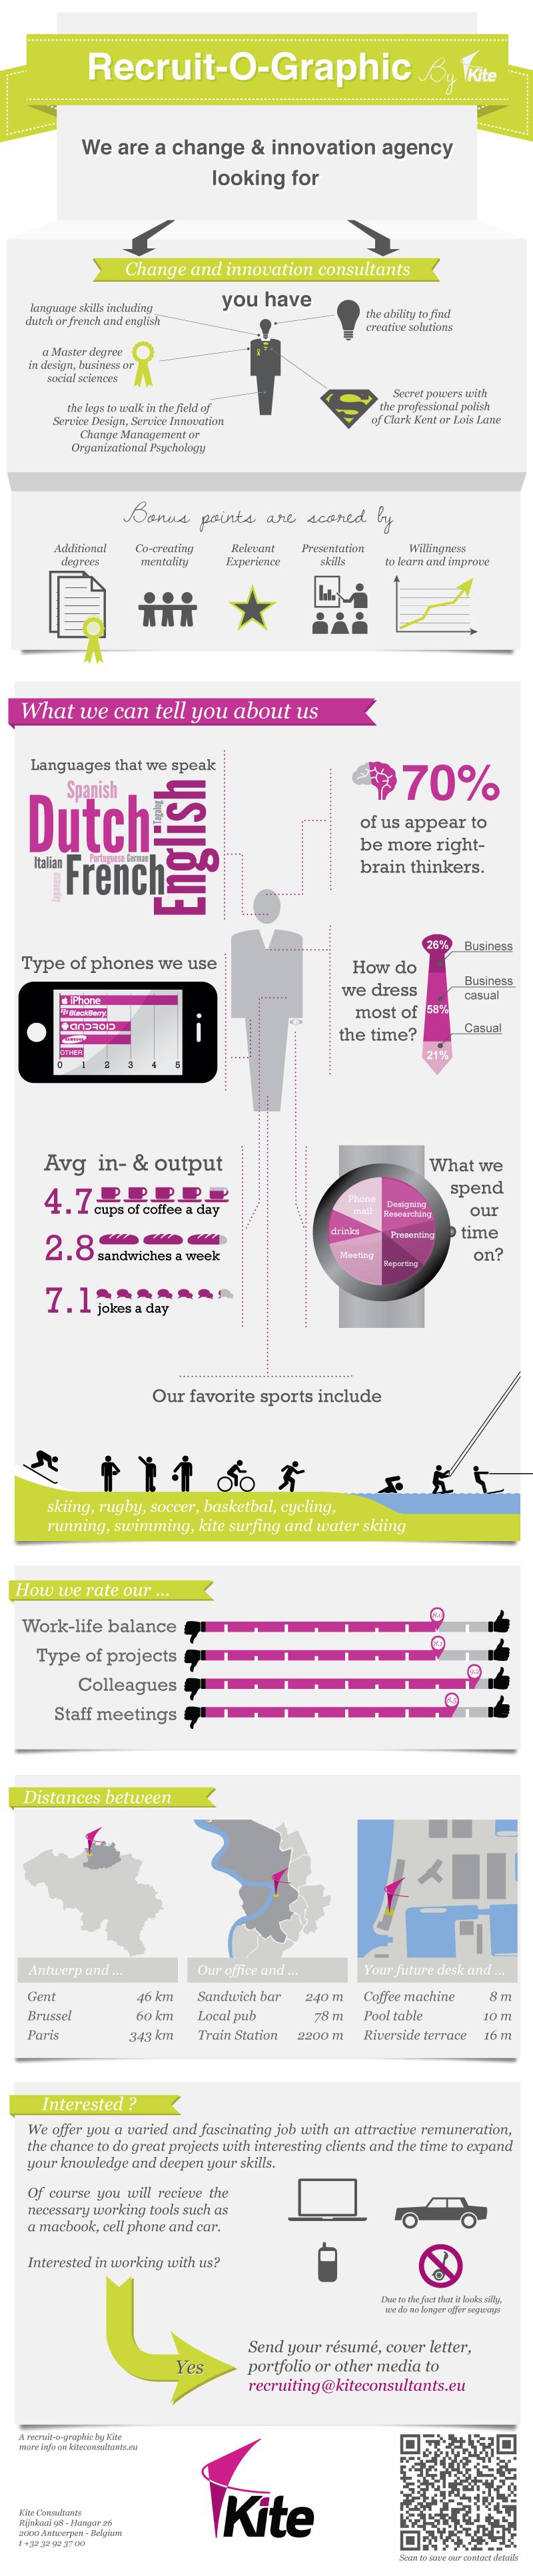 Recruit-O-Graphic infographic